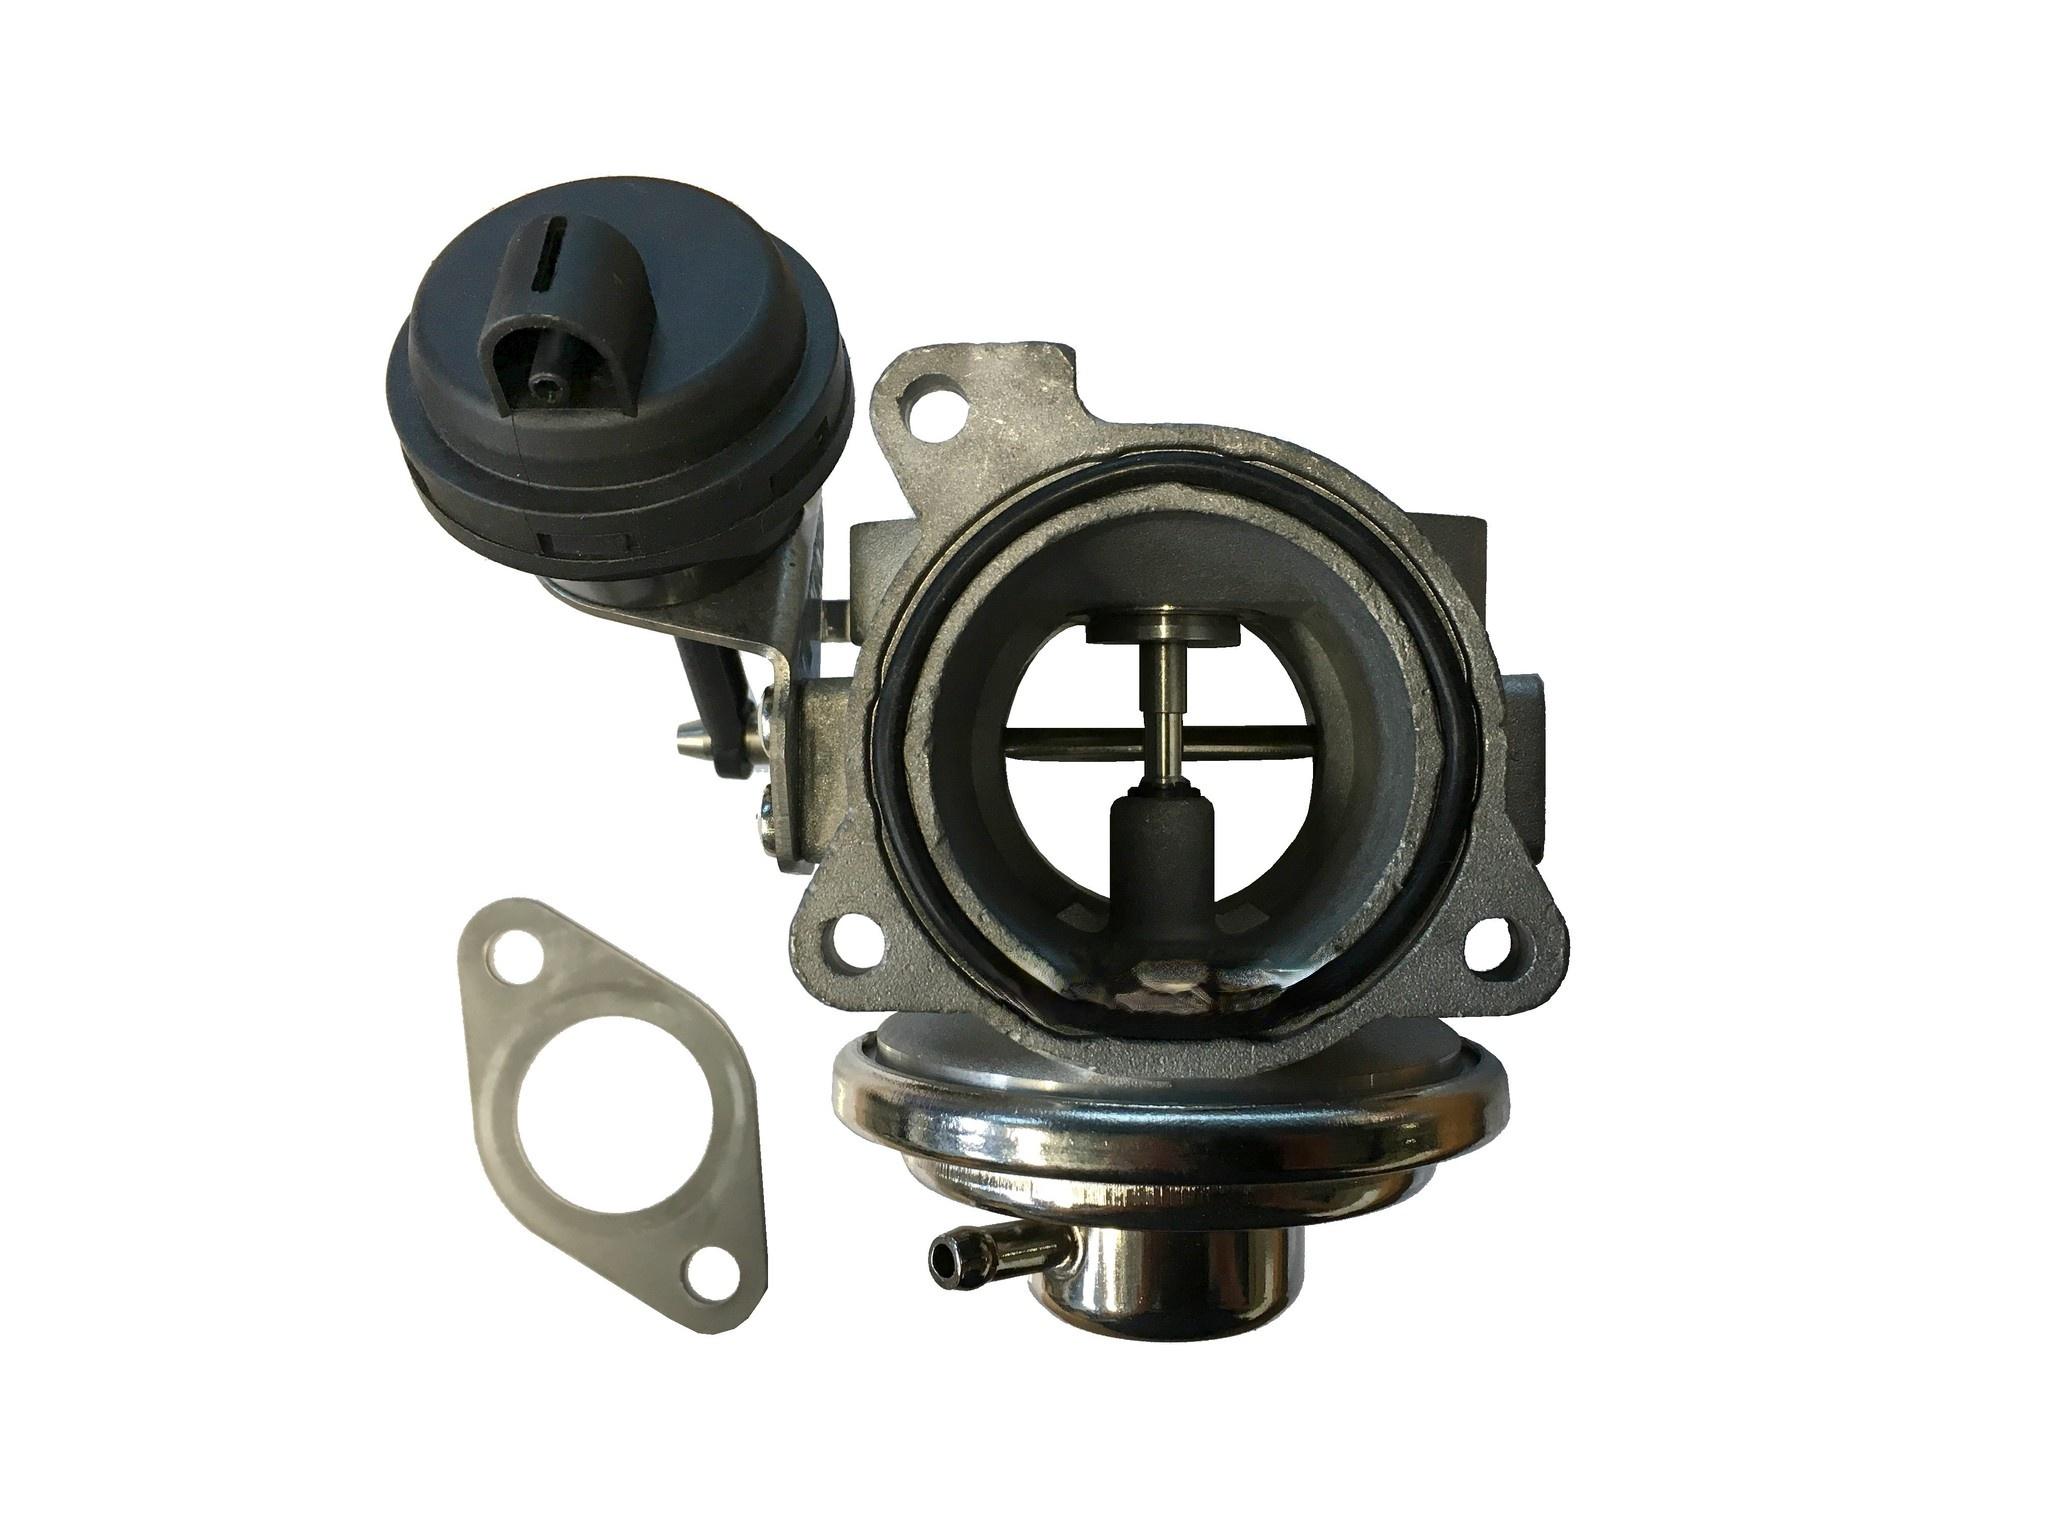 EGR ventil - TR00612 New Beetle 1.9TDi 74kW EGR/AGR ventily prémiové kvality